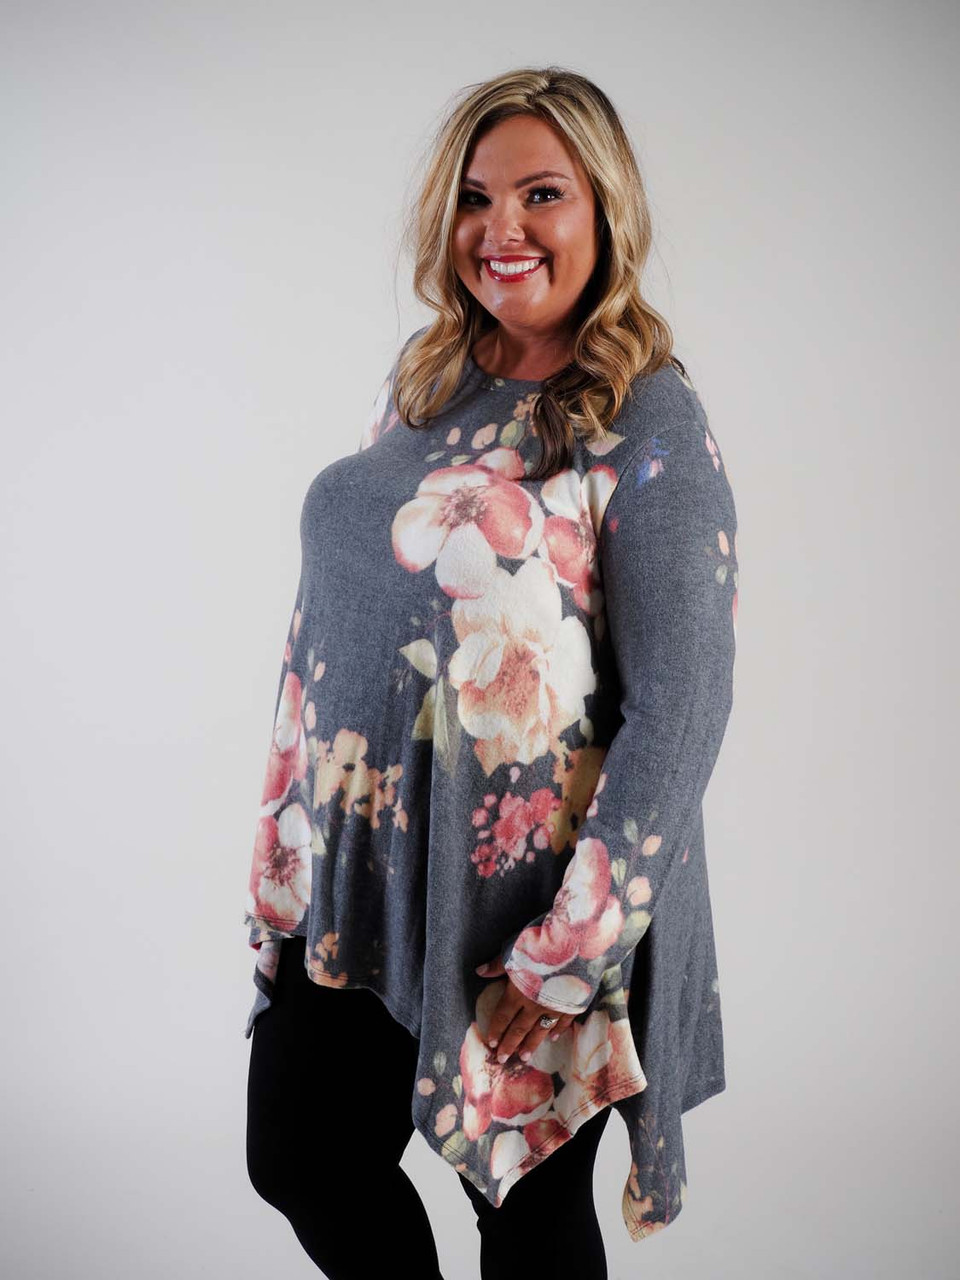 oddi Plus clothing curvy clothing fleece top with asymmetrical hem floral pattern charcoal grey